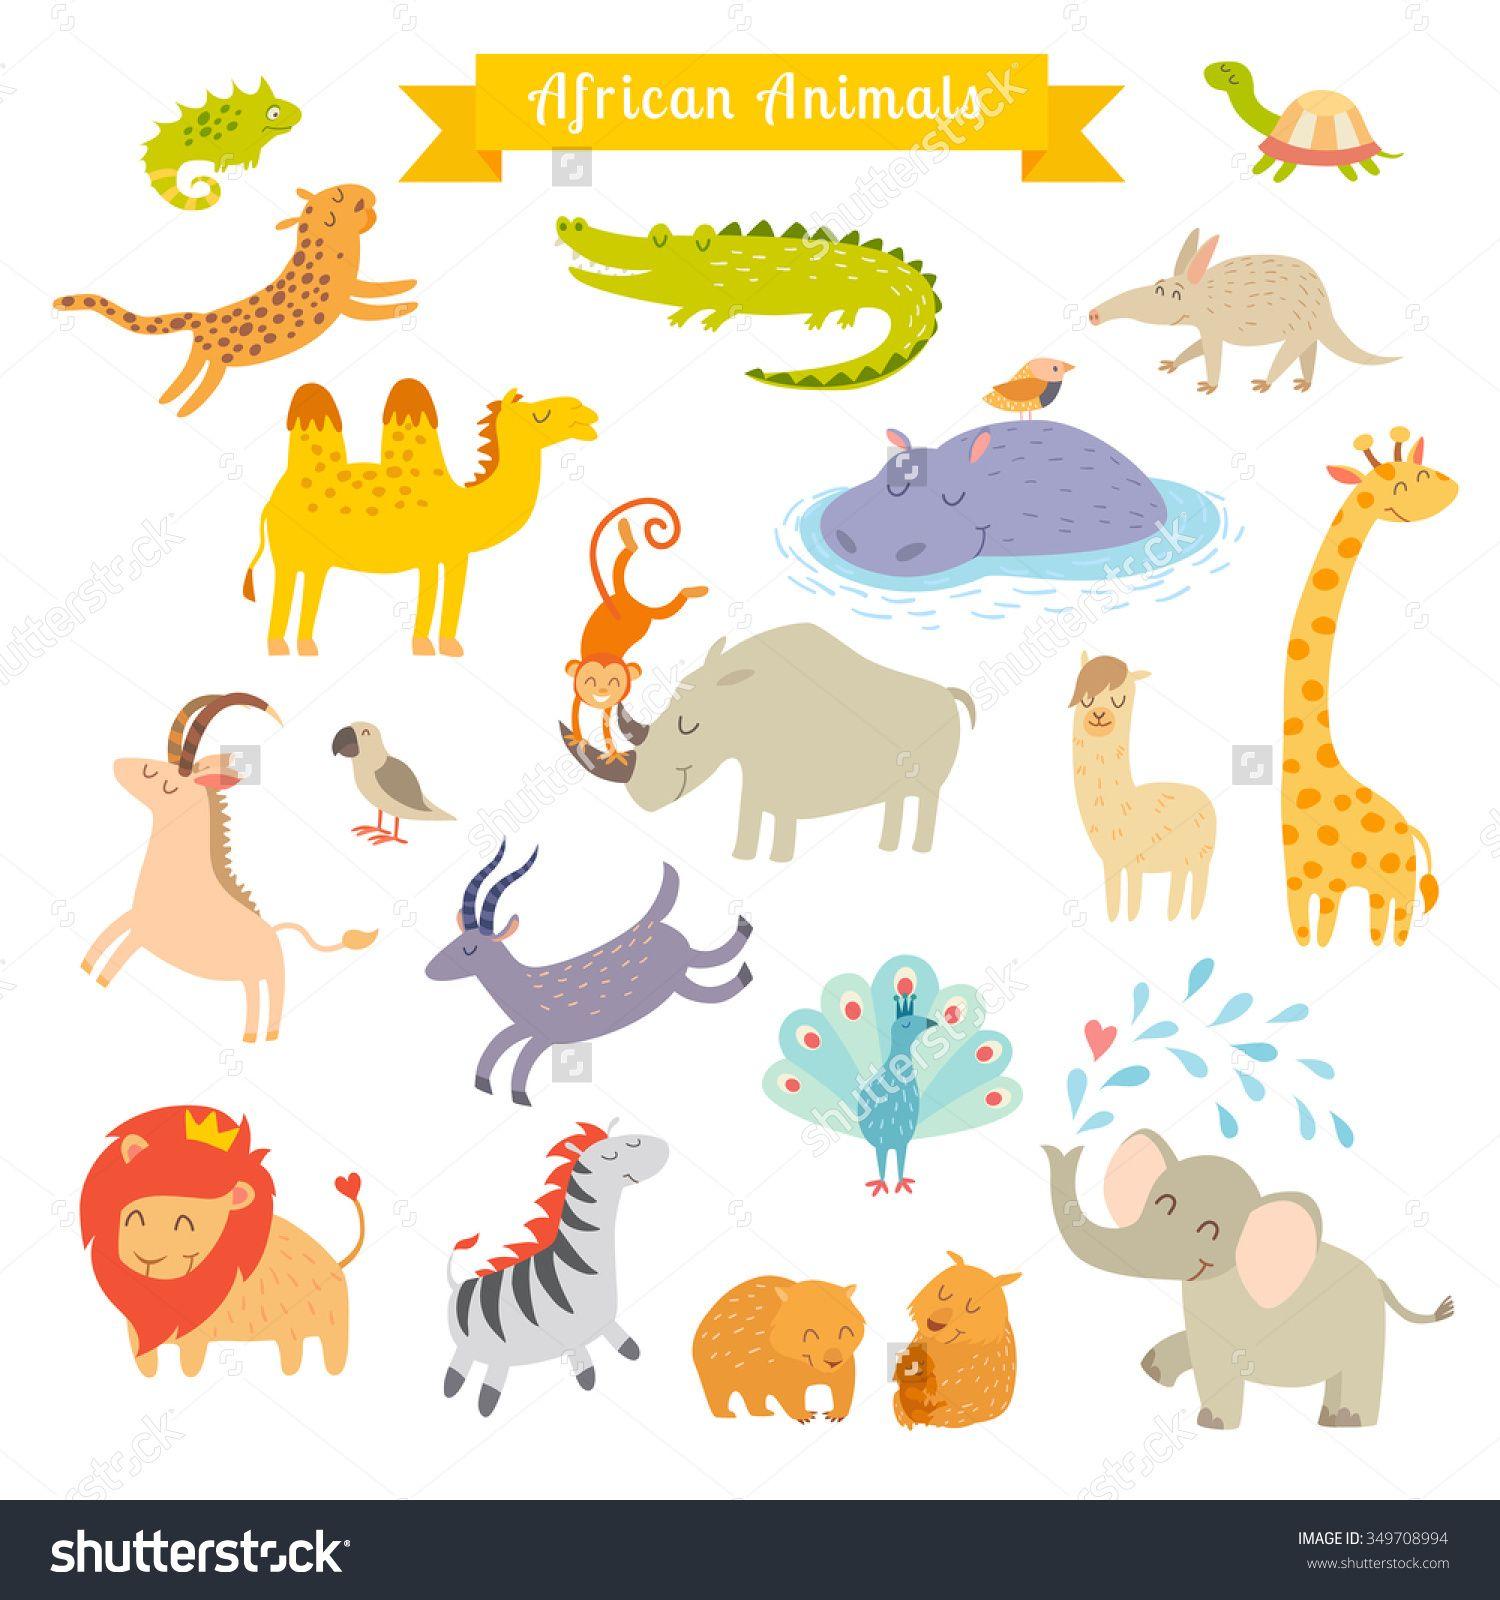 Africa Animals Vector Illustrationafrica Animals Cartoon Styleafrica Animals Set Africa